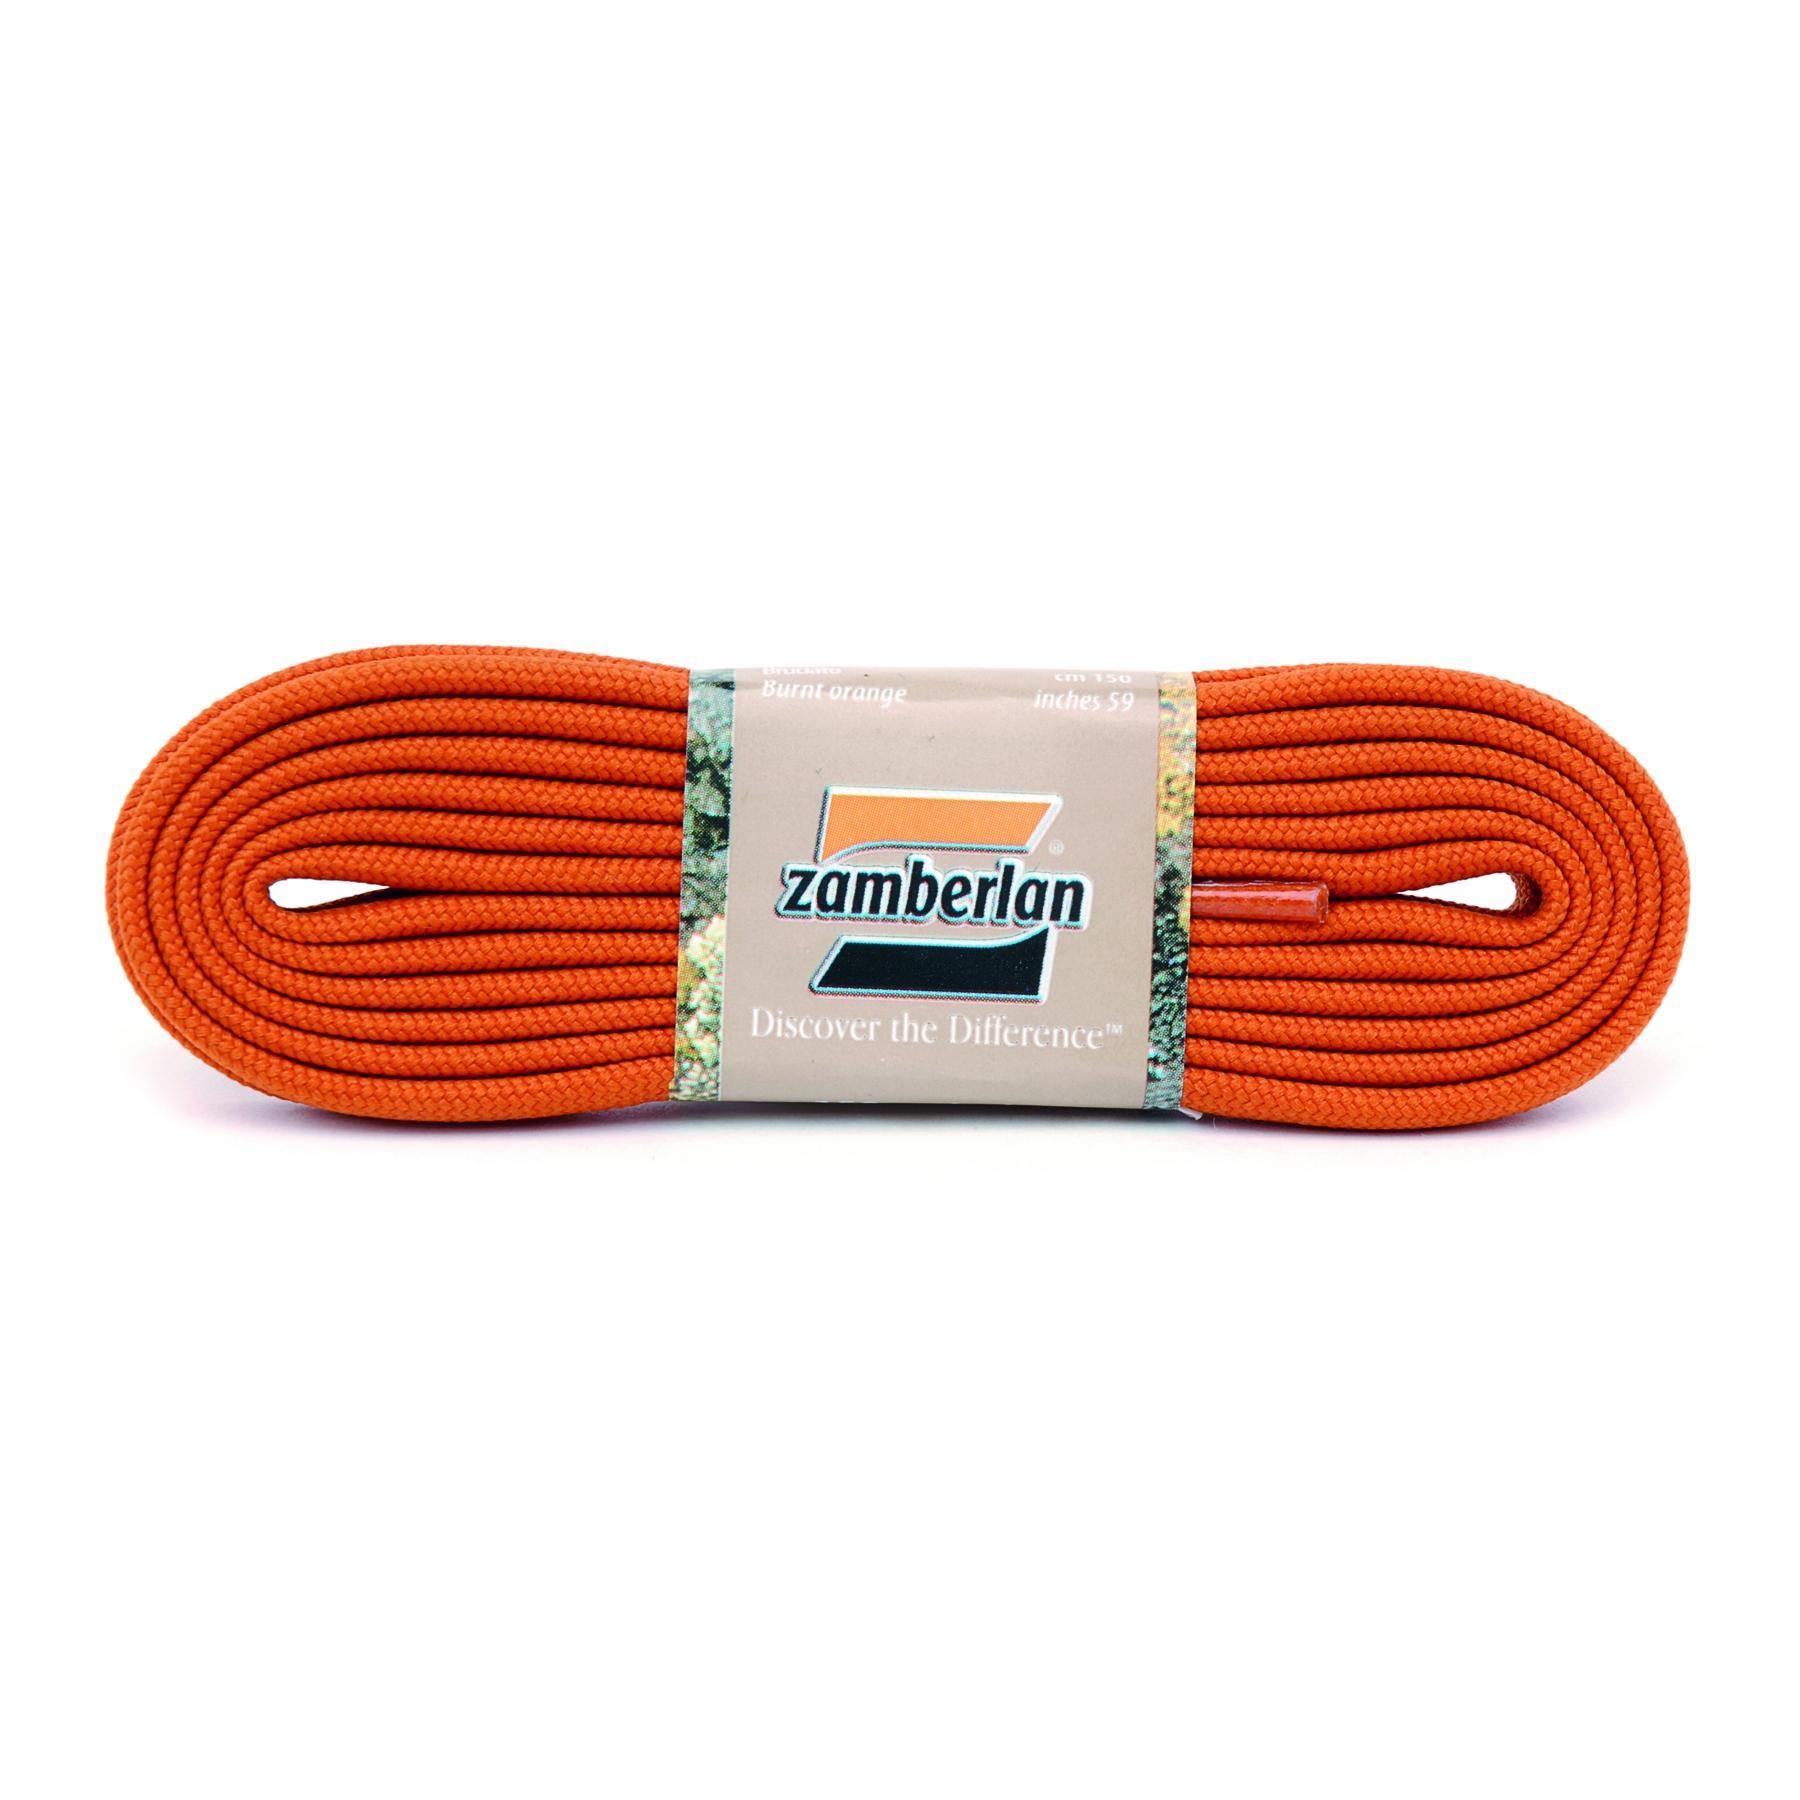 ZAMBERLAN® REPLACEMENT FLAT LACES   -   Orange